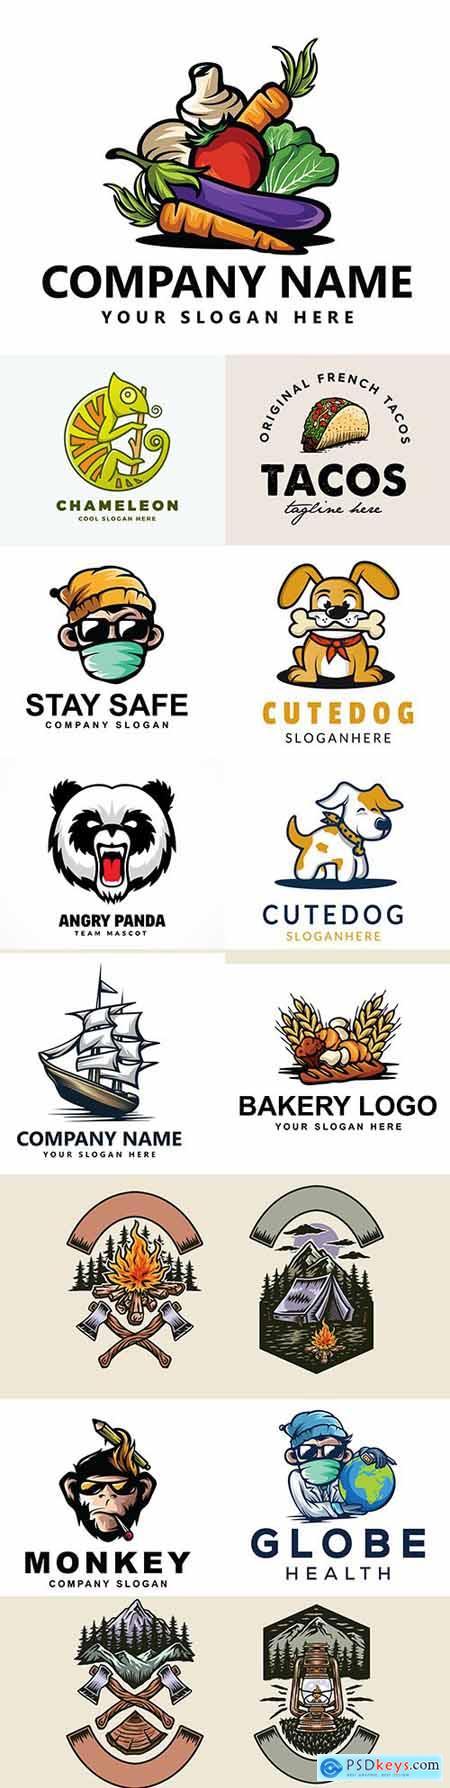 Brand name company logos business corporate design